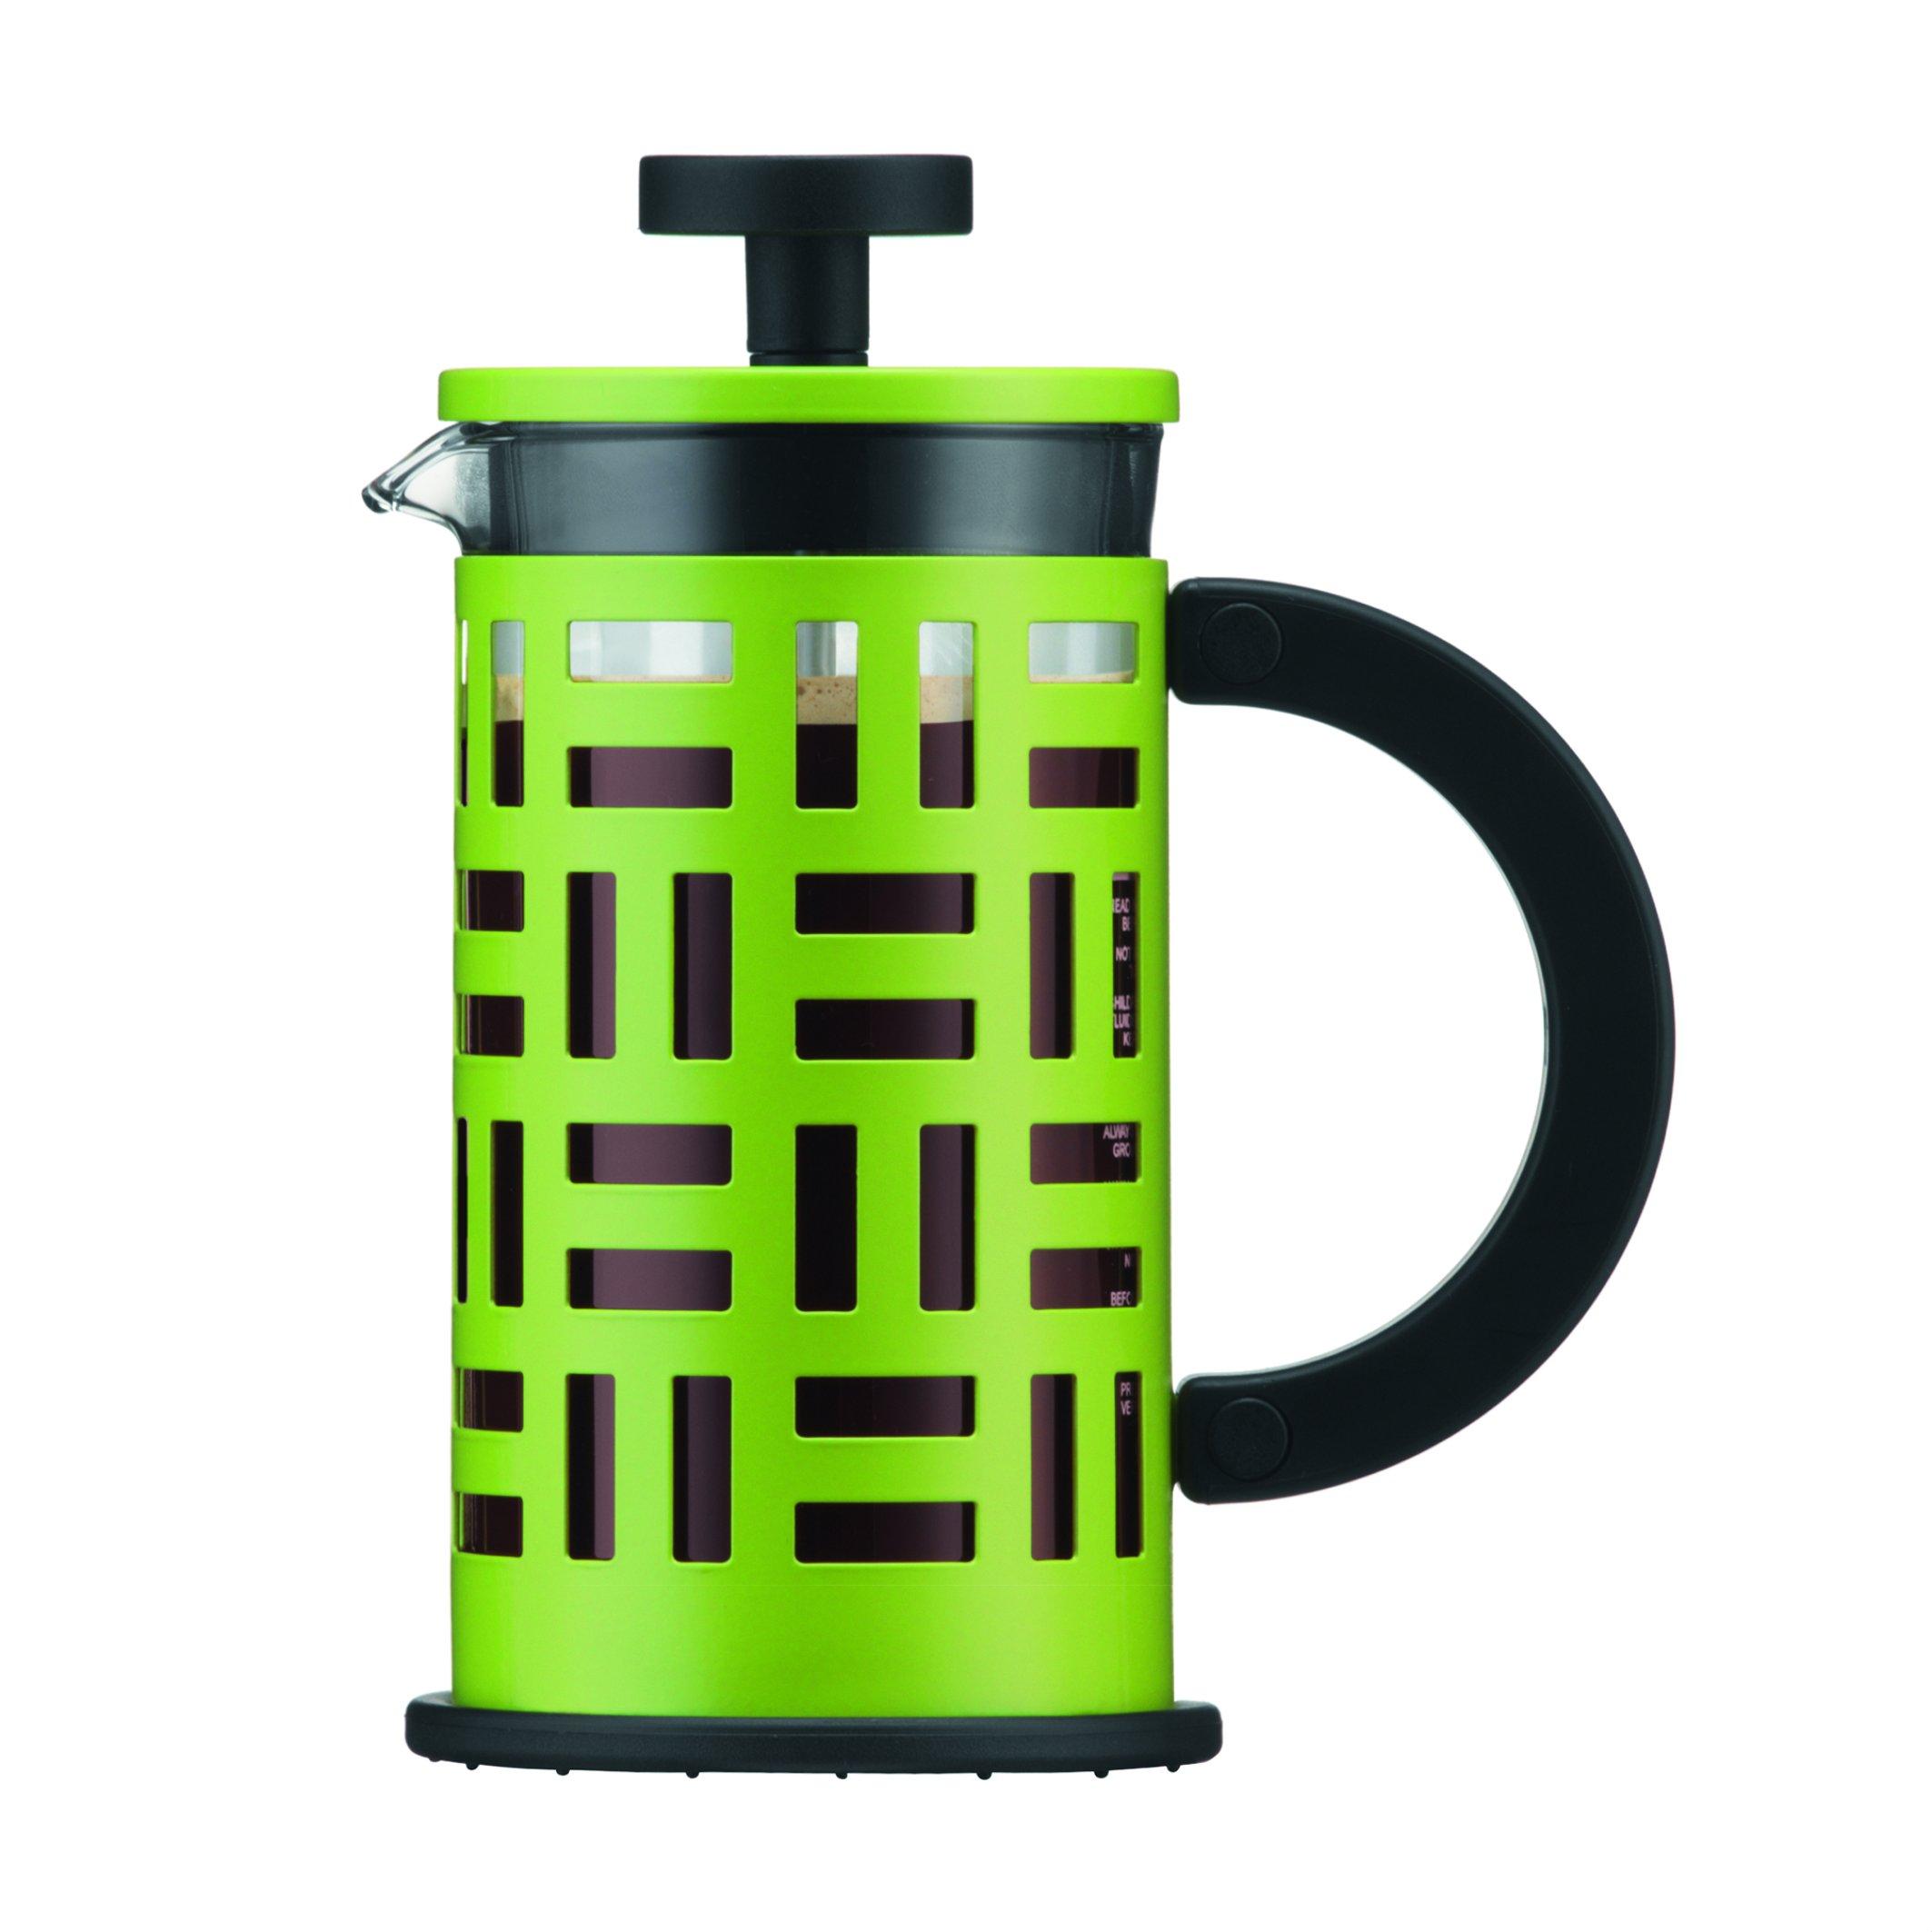 Bodum Eileen 3-Cup Coffee Maker, 12-Ounce, Green by Bodum (Image #1)